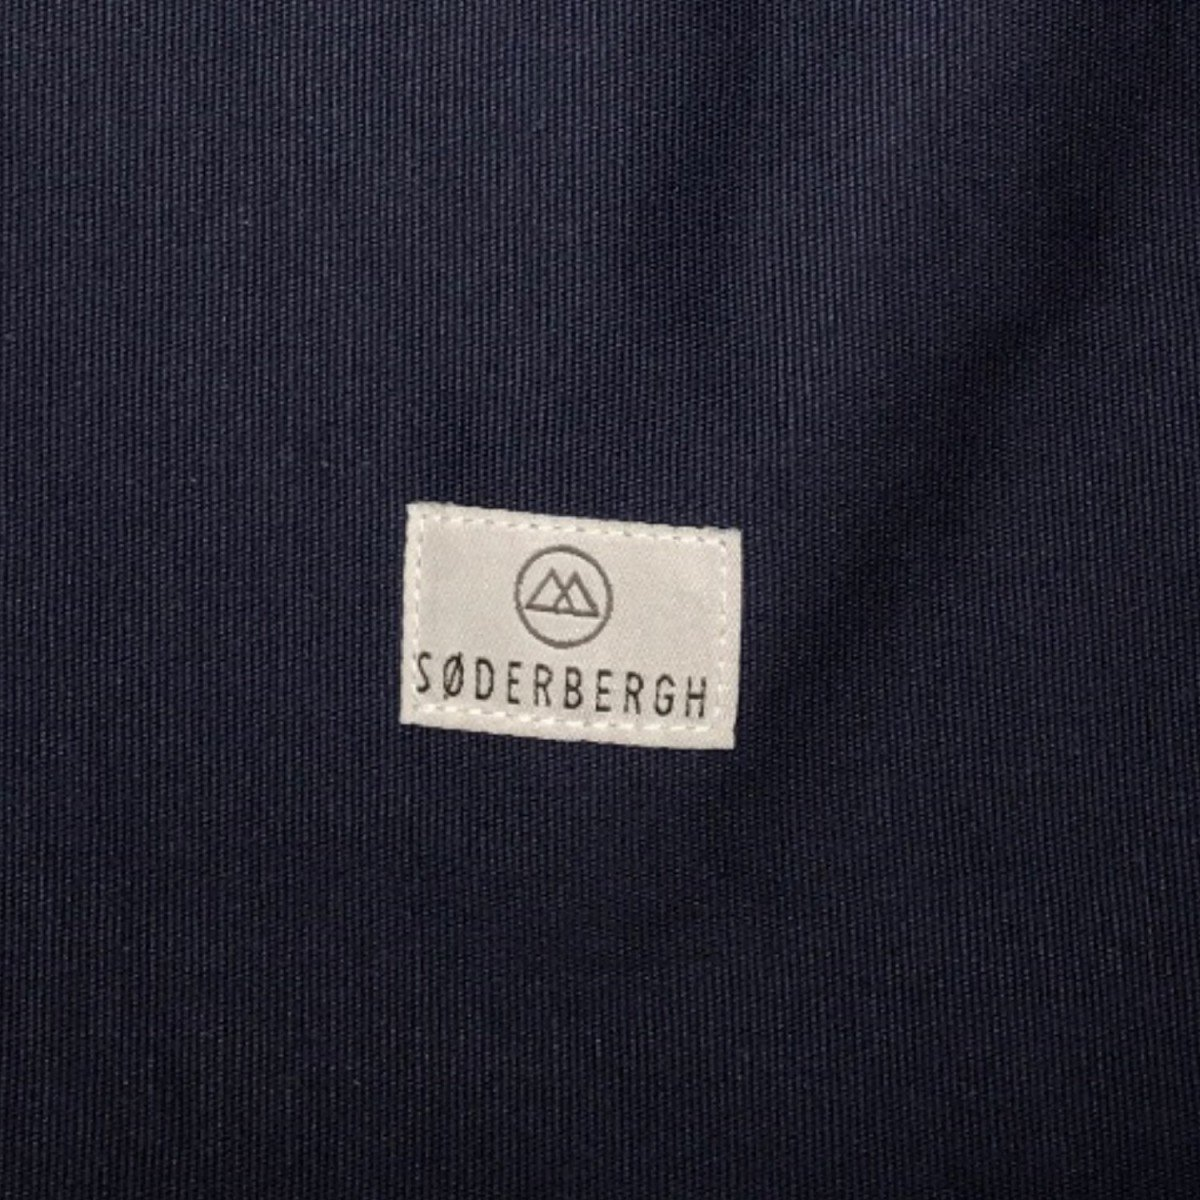 d433980afc SODERBERGH Sacs de sport Sac à dos sac en toile Hipster Unisexe Femme Homme  Enfant, Farbe:Blue